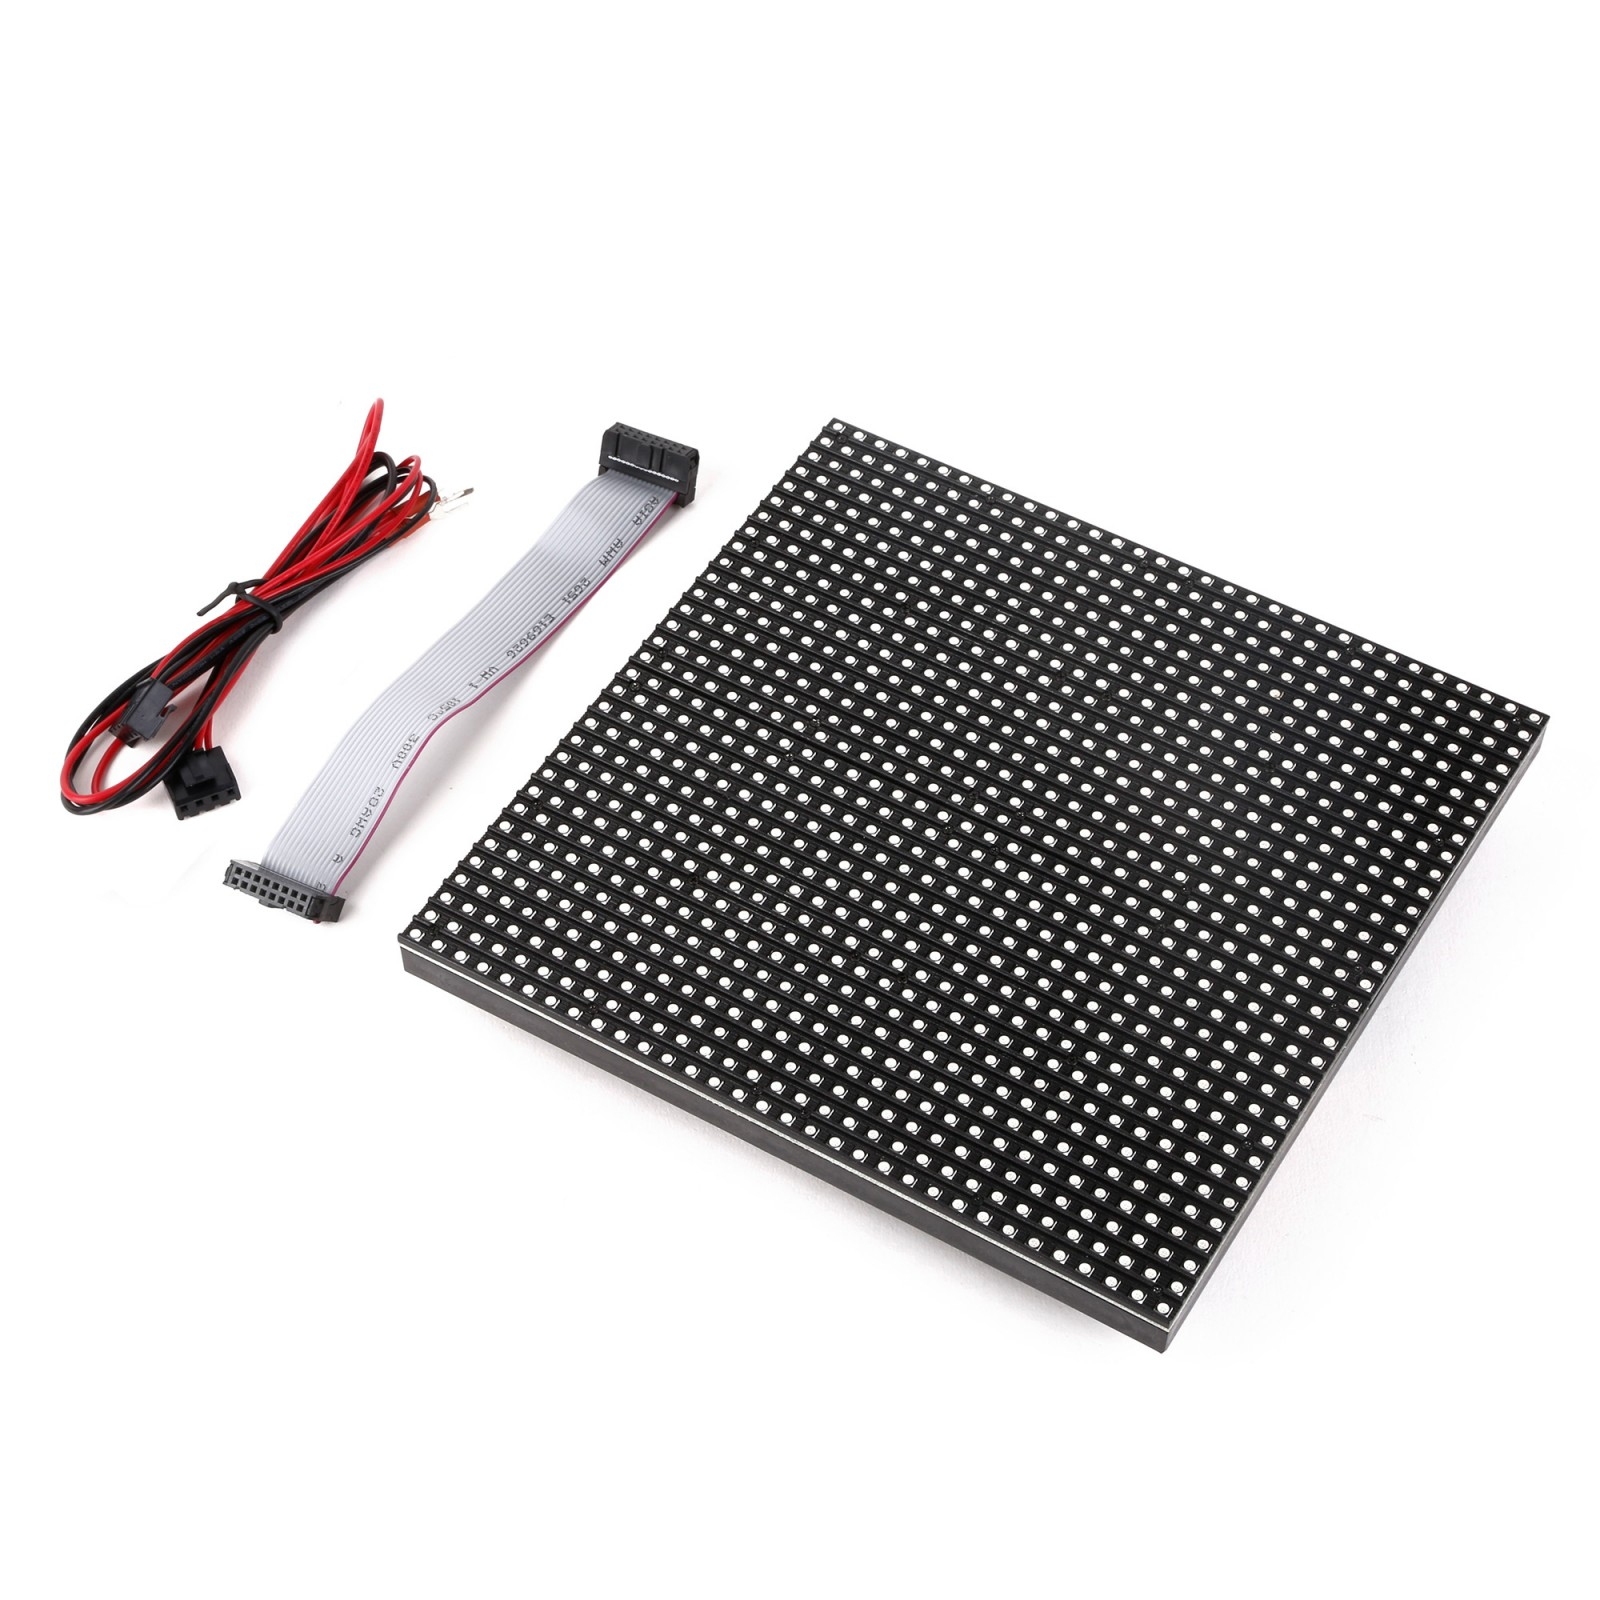 32x32 Rgb Led Matrix Panel 5mm Pitch Wiring Mgctlbxnmzp Mgctlbxv5112 Mgctlbxlc Mgctlbxpprestashop